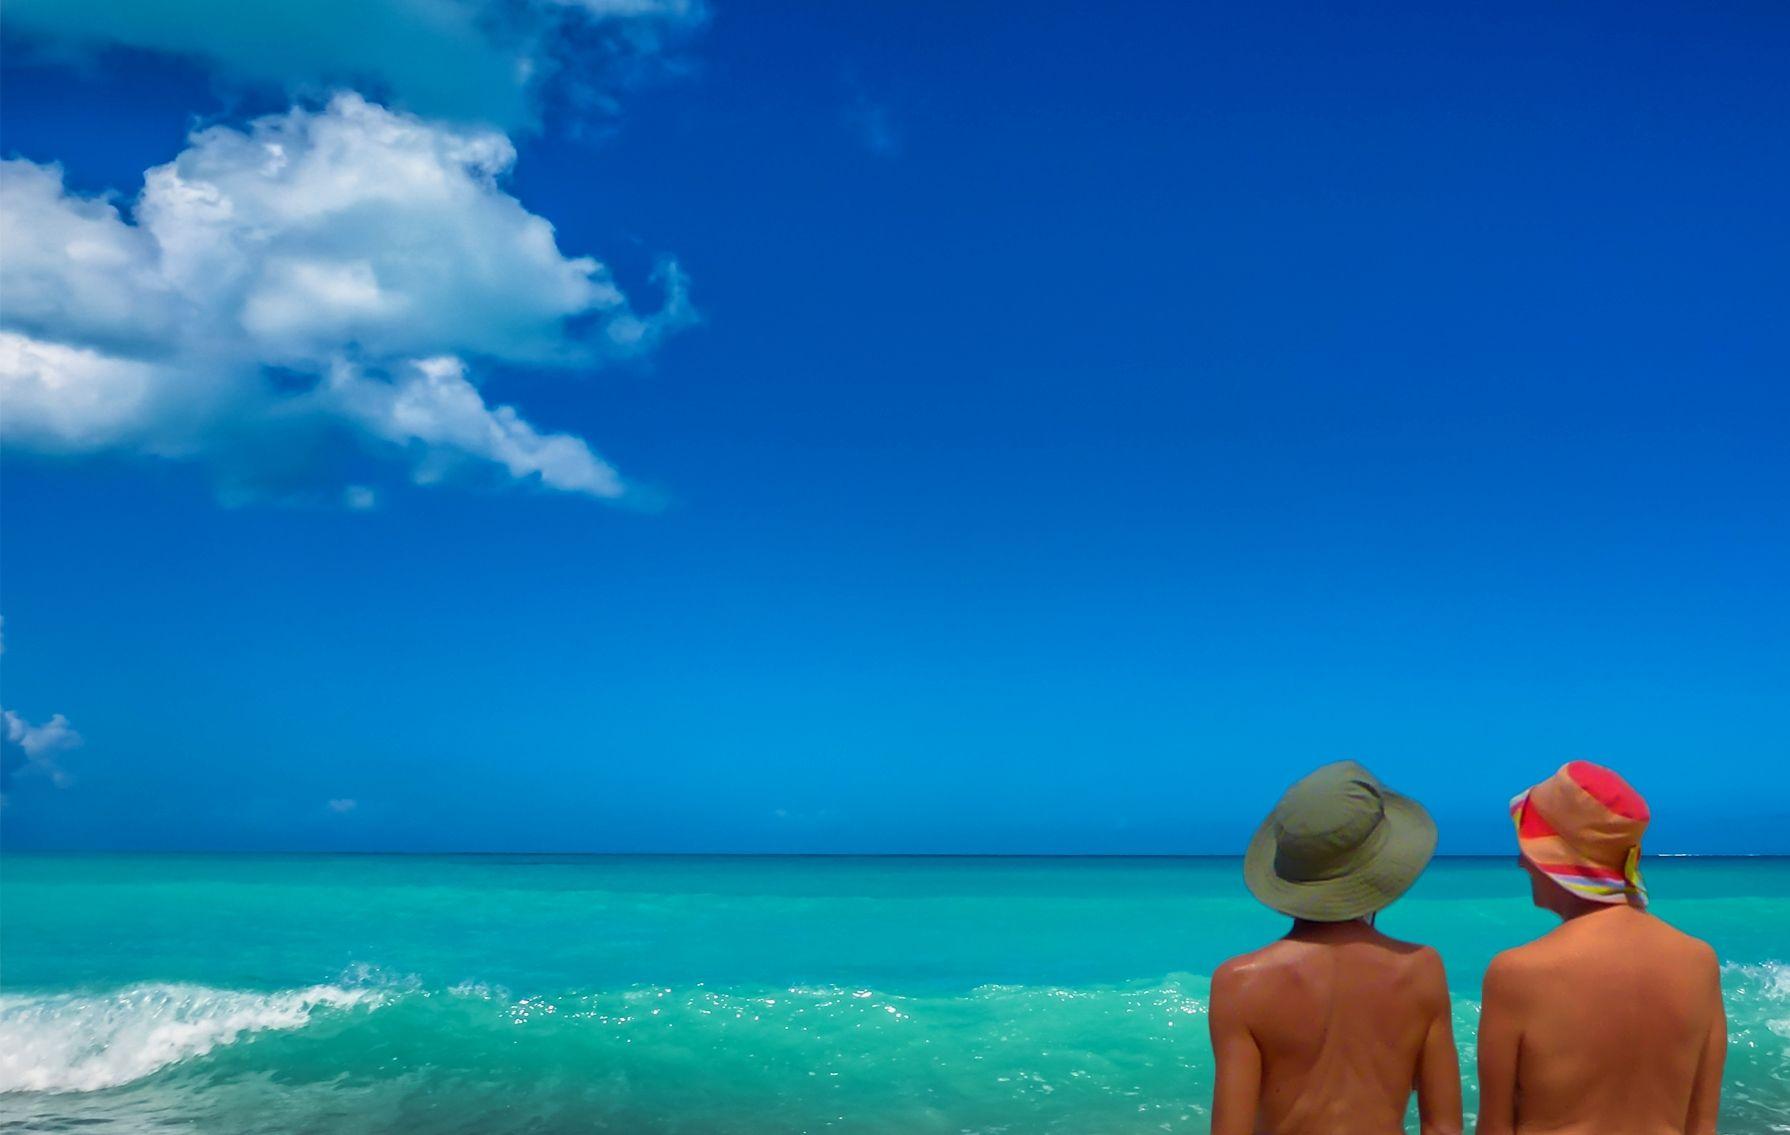 Pin by Egypt on Egypt Vacation | Pinterest | Greek islands ...